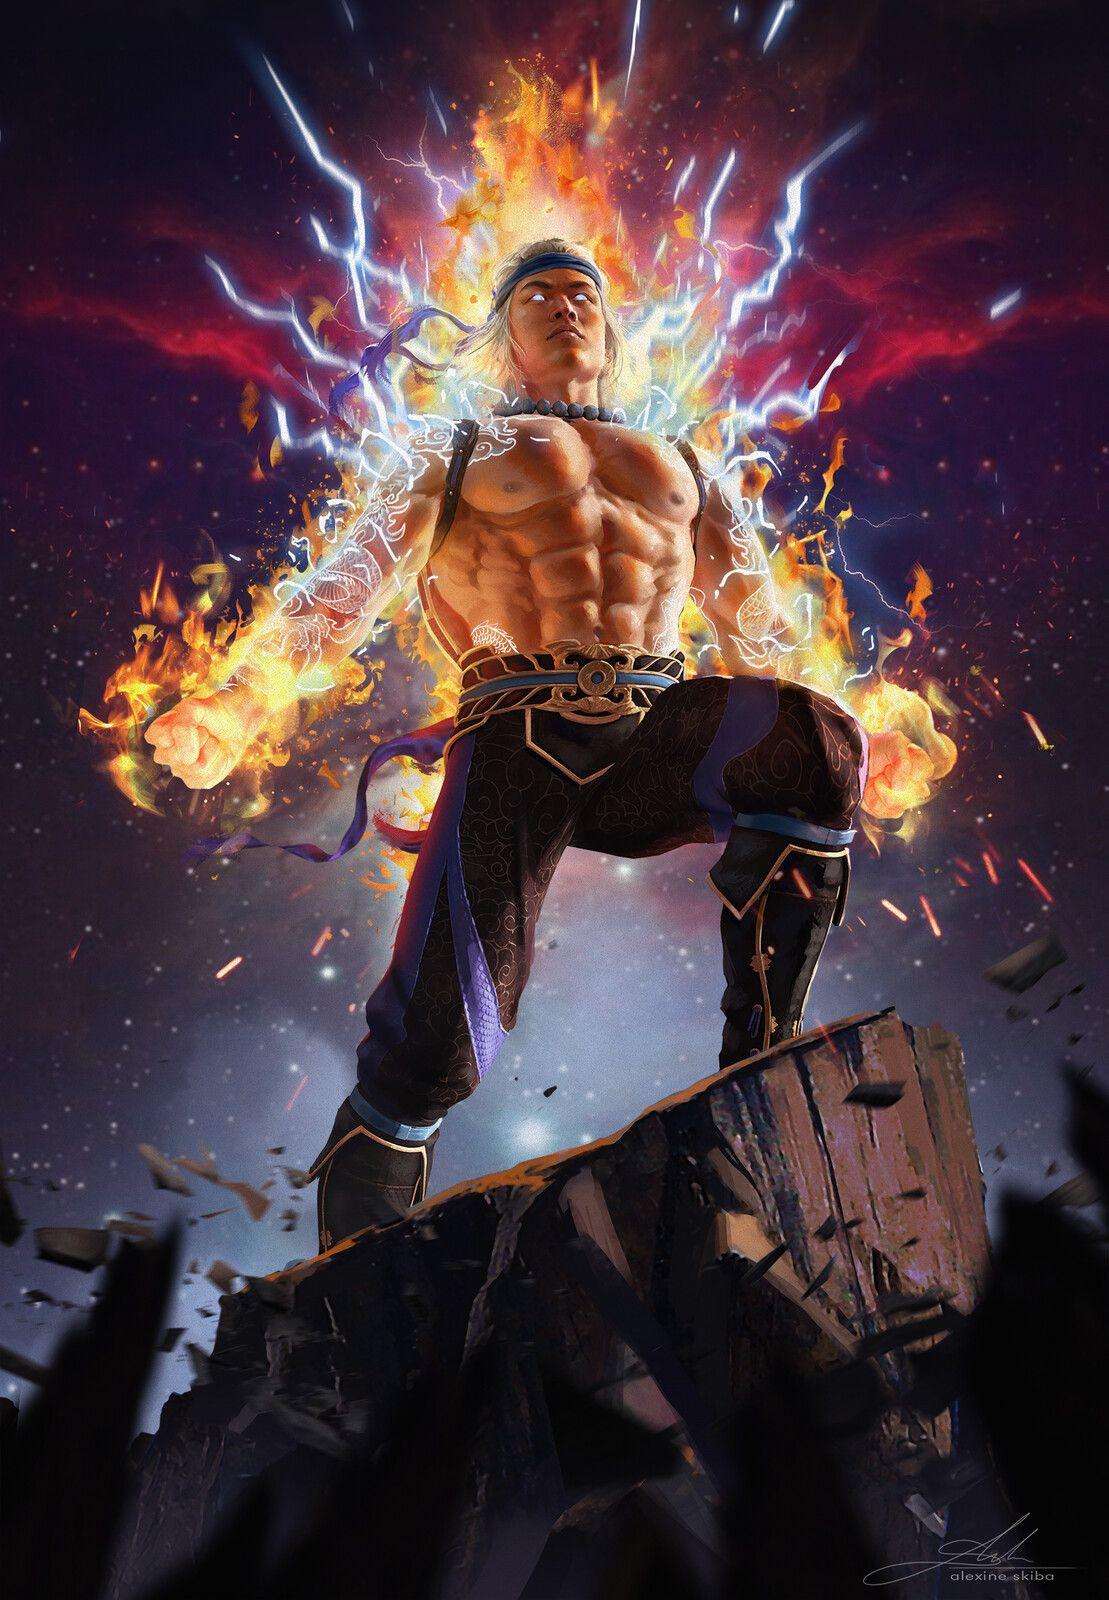 Liu Kang God Of Thunder And Fire Aleksandra Skiba On Artstation At Https Www Artstation Co Raiden Mortal Kombat Mortal Kombat Art Mortal Kombat Characters